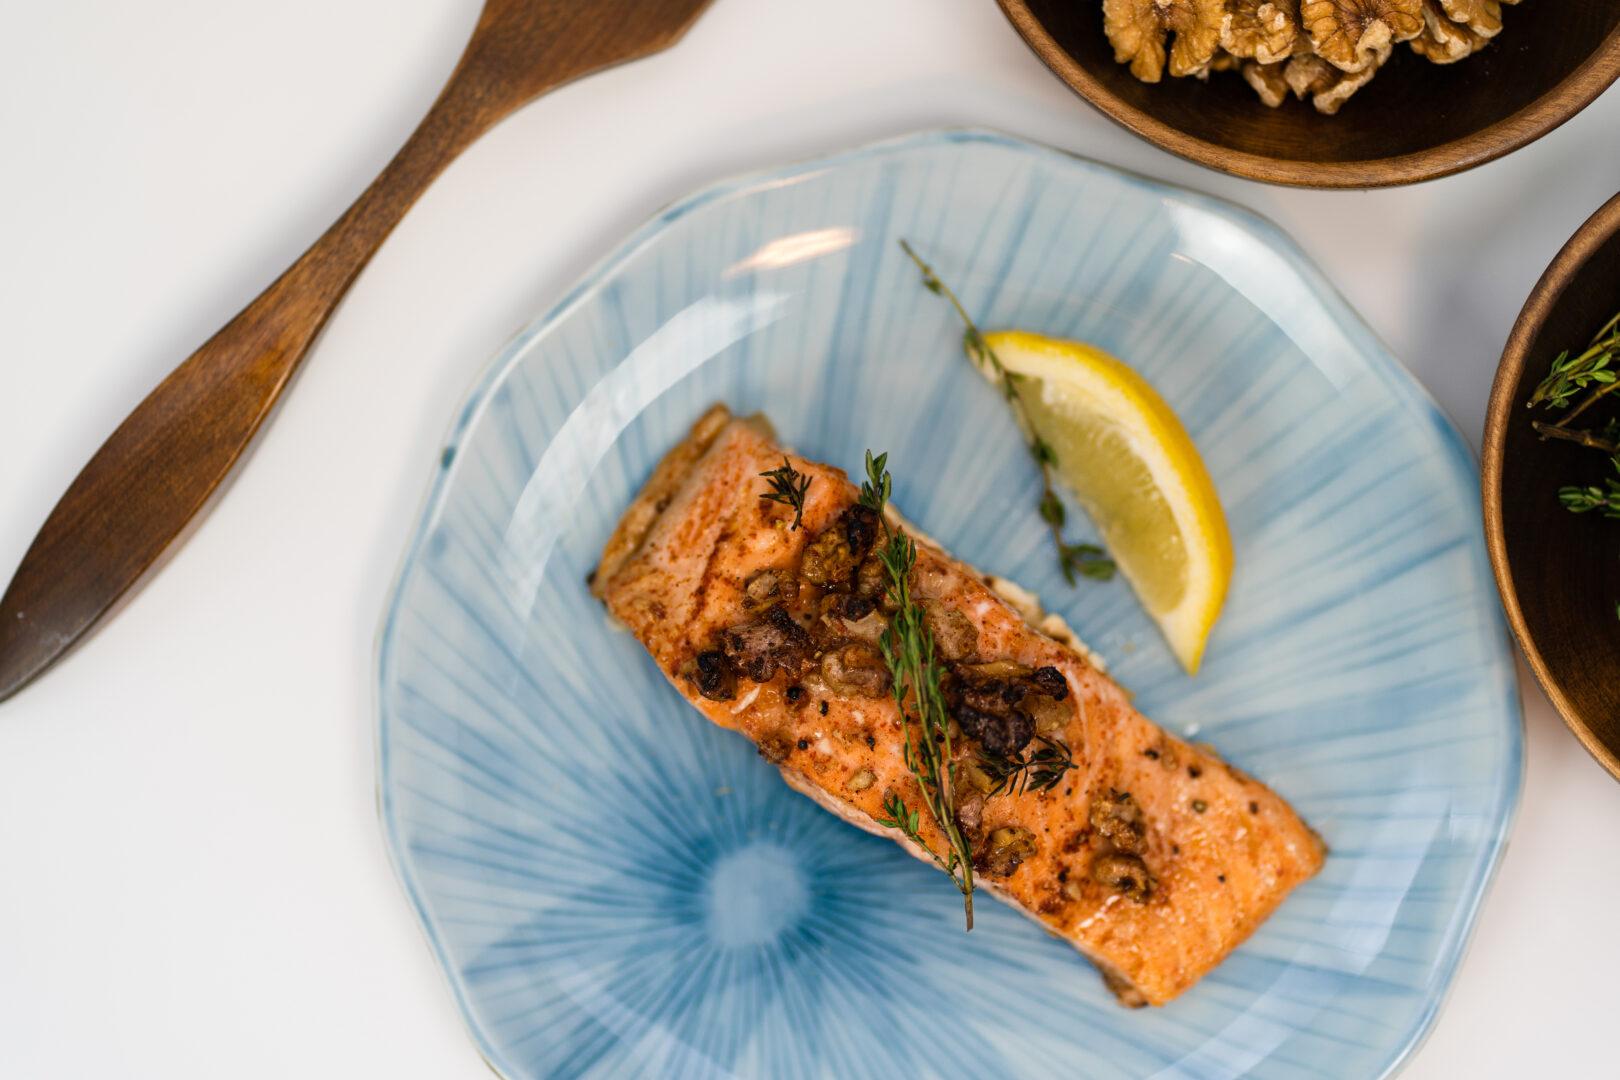 Maple Walnut Salmon with Bluehouse Salmon